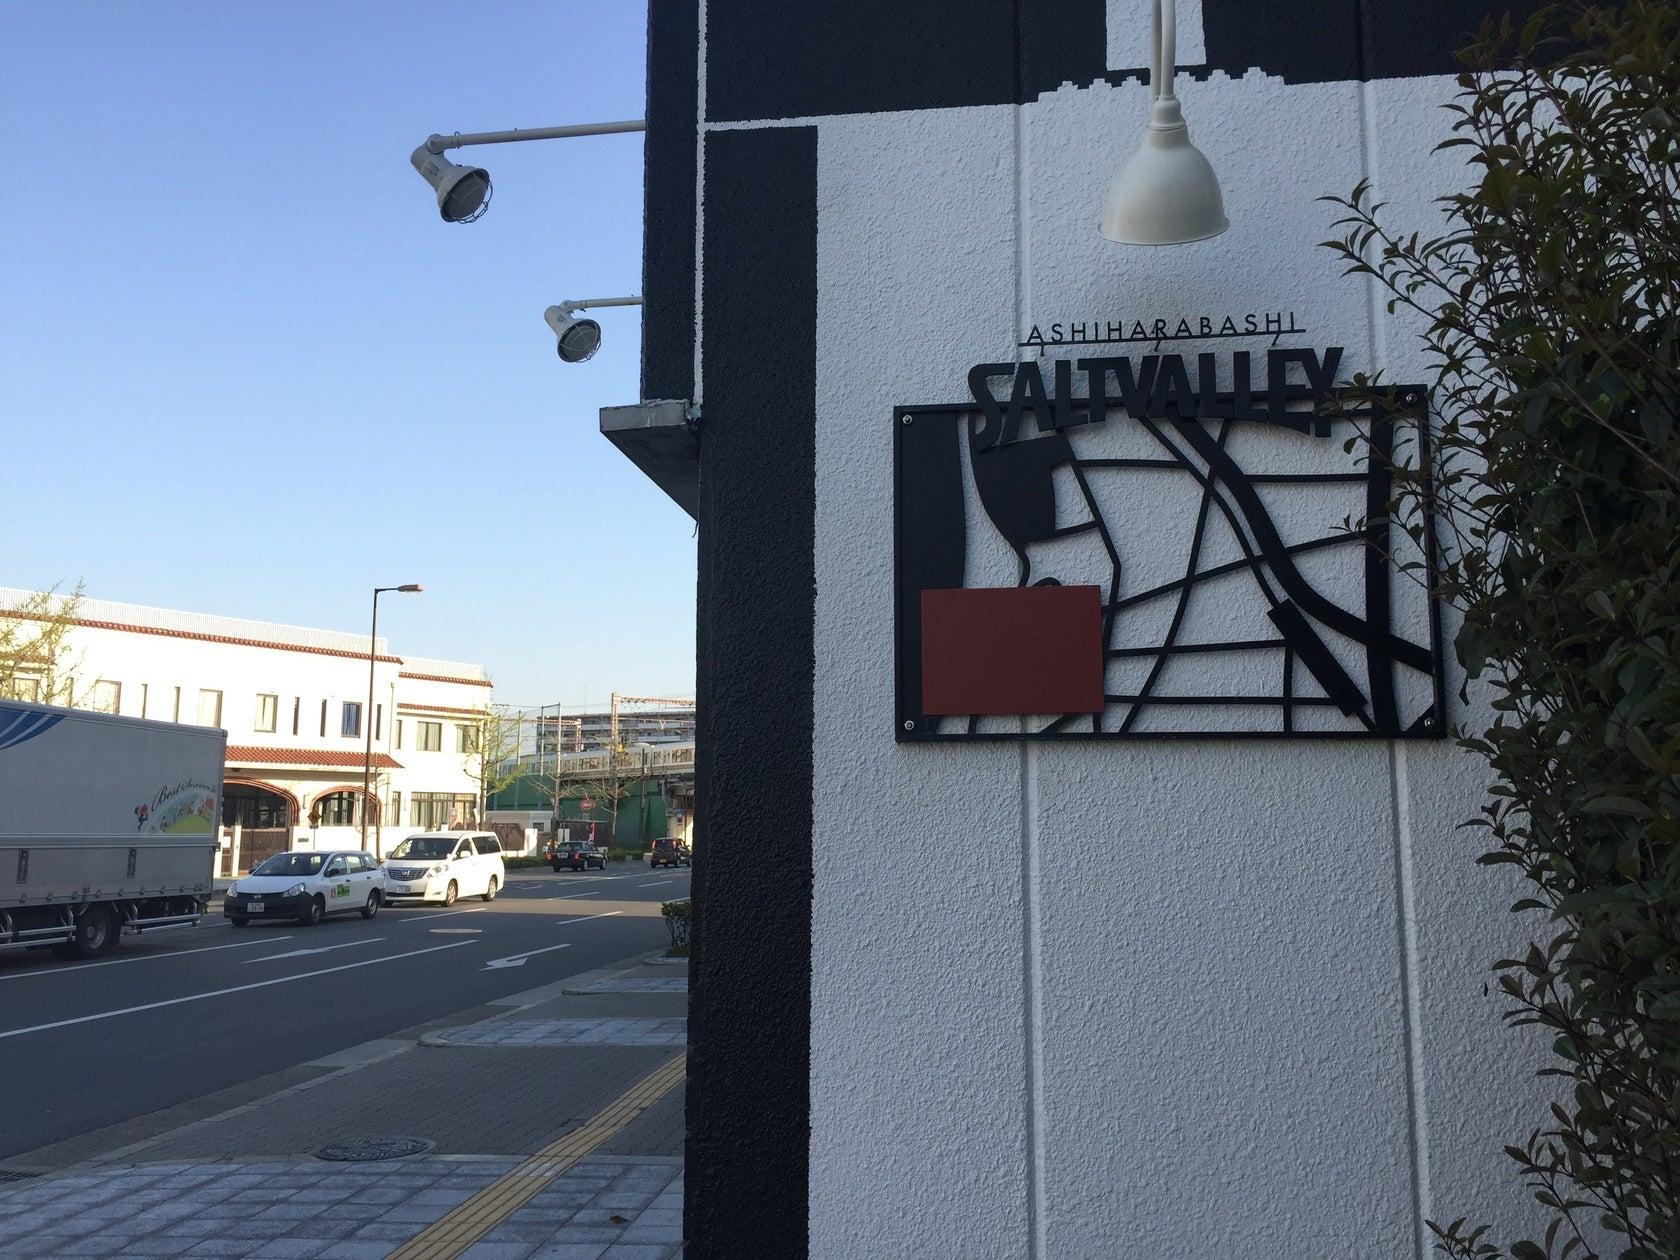 JR大阪環状線「芦原橋駅」2分まるまる貸切!ボタニカルガーデン利用可 のサムネイル